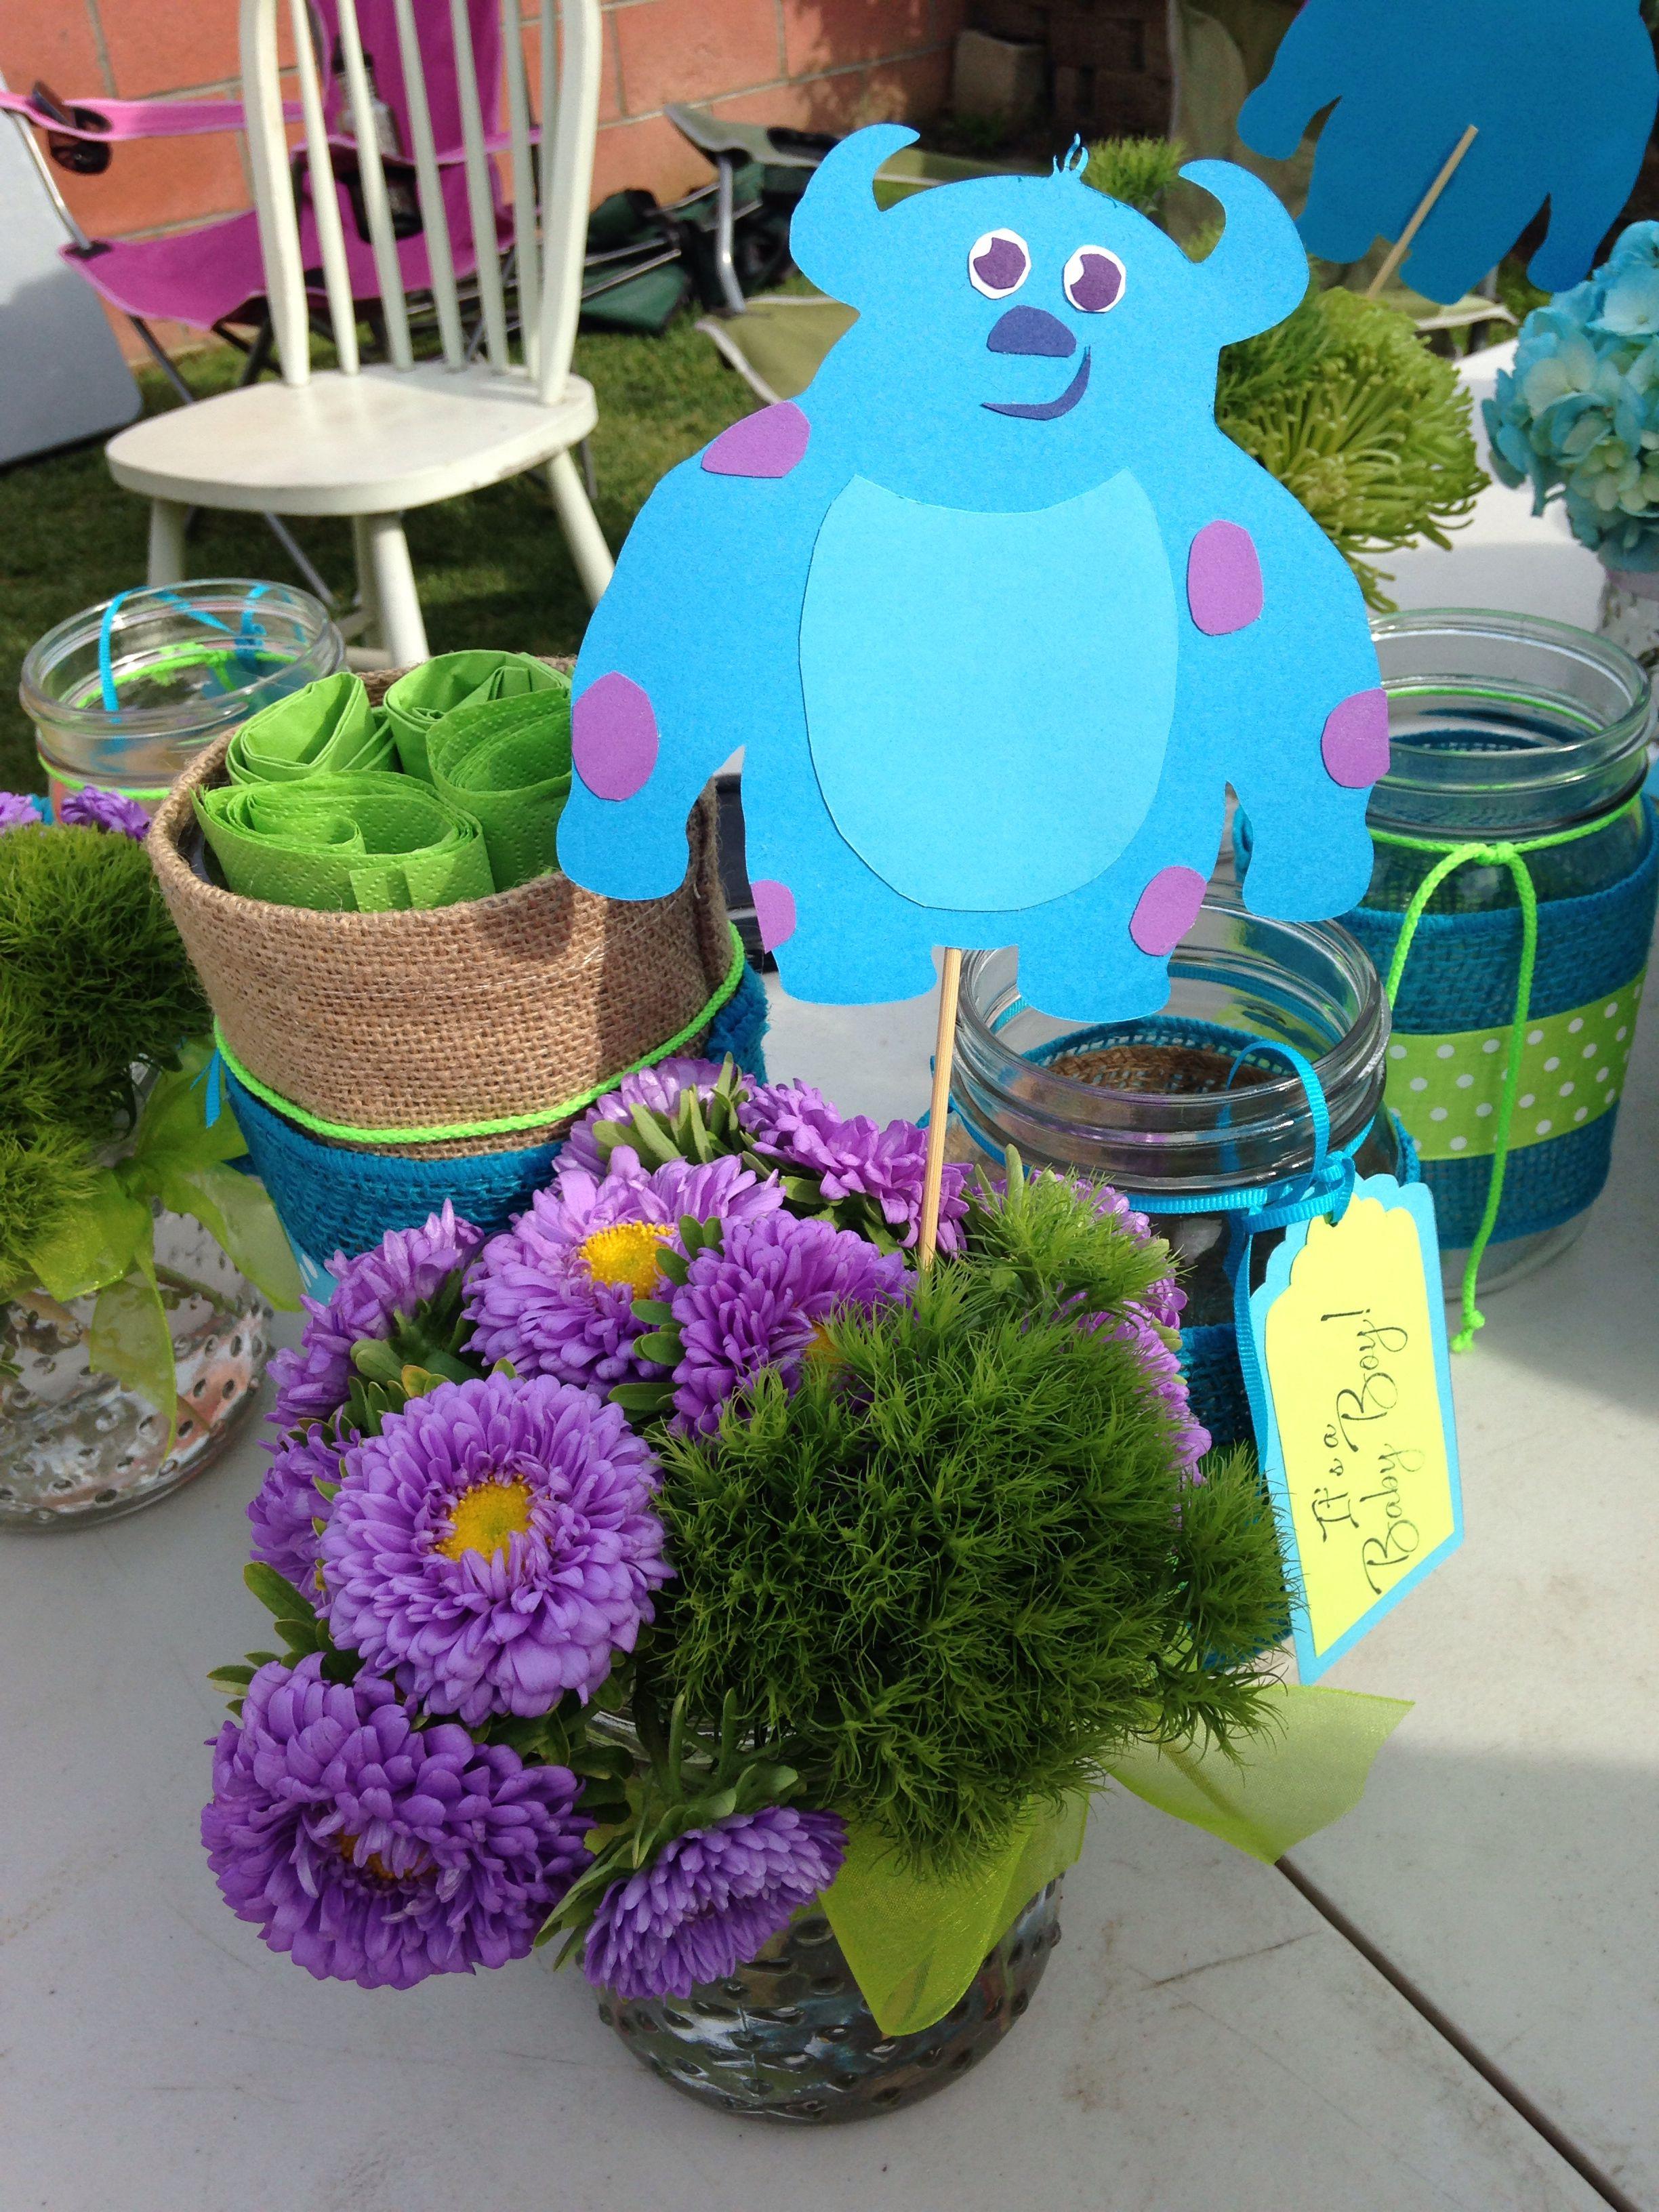 Monsters Inc baby shower centerpieces Wild flowers mason jars